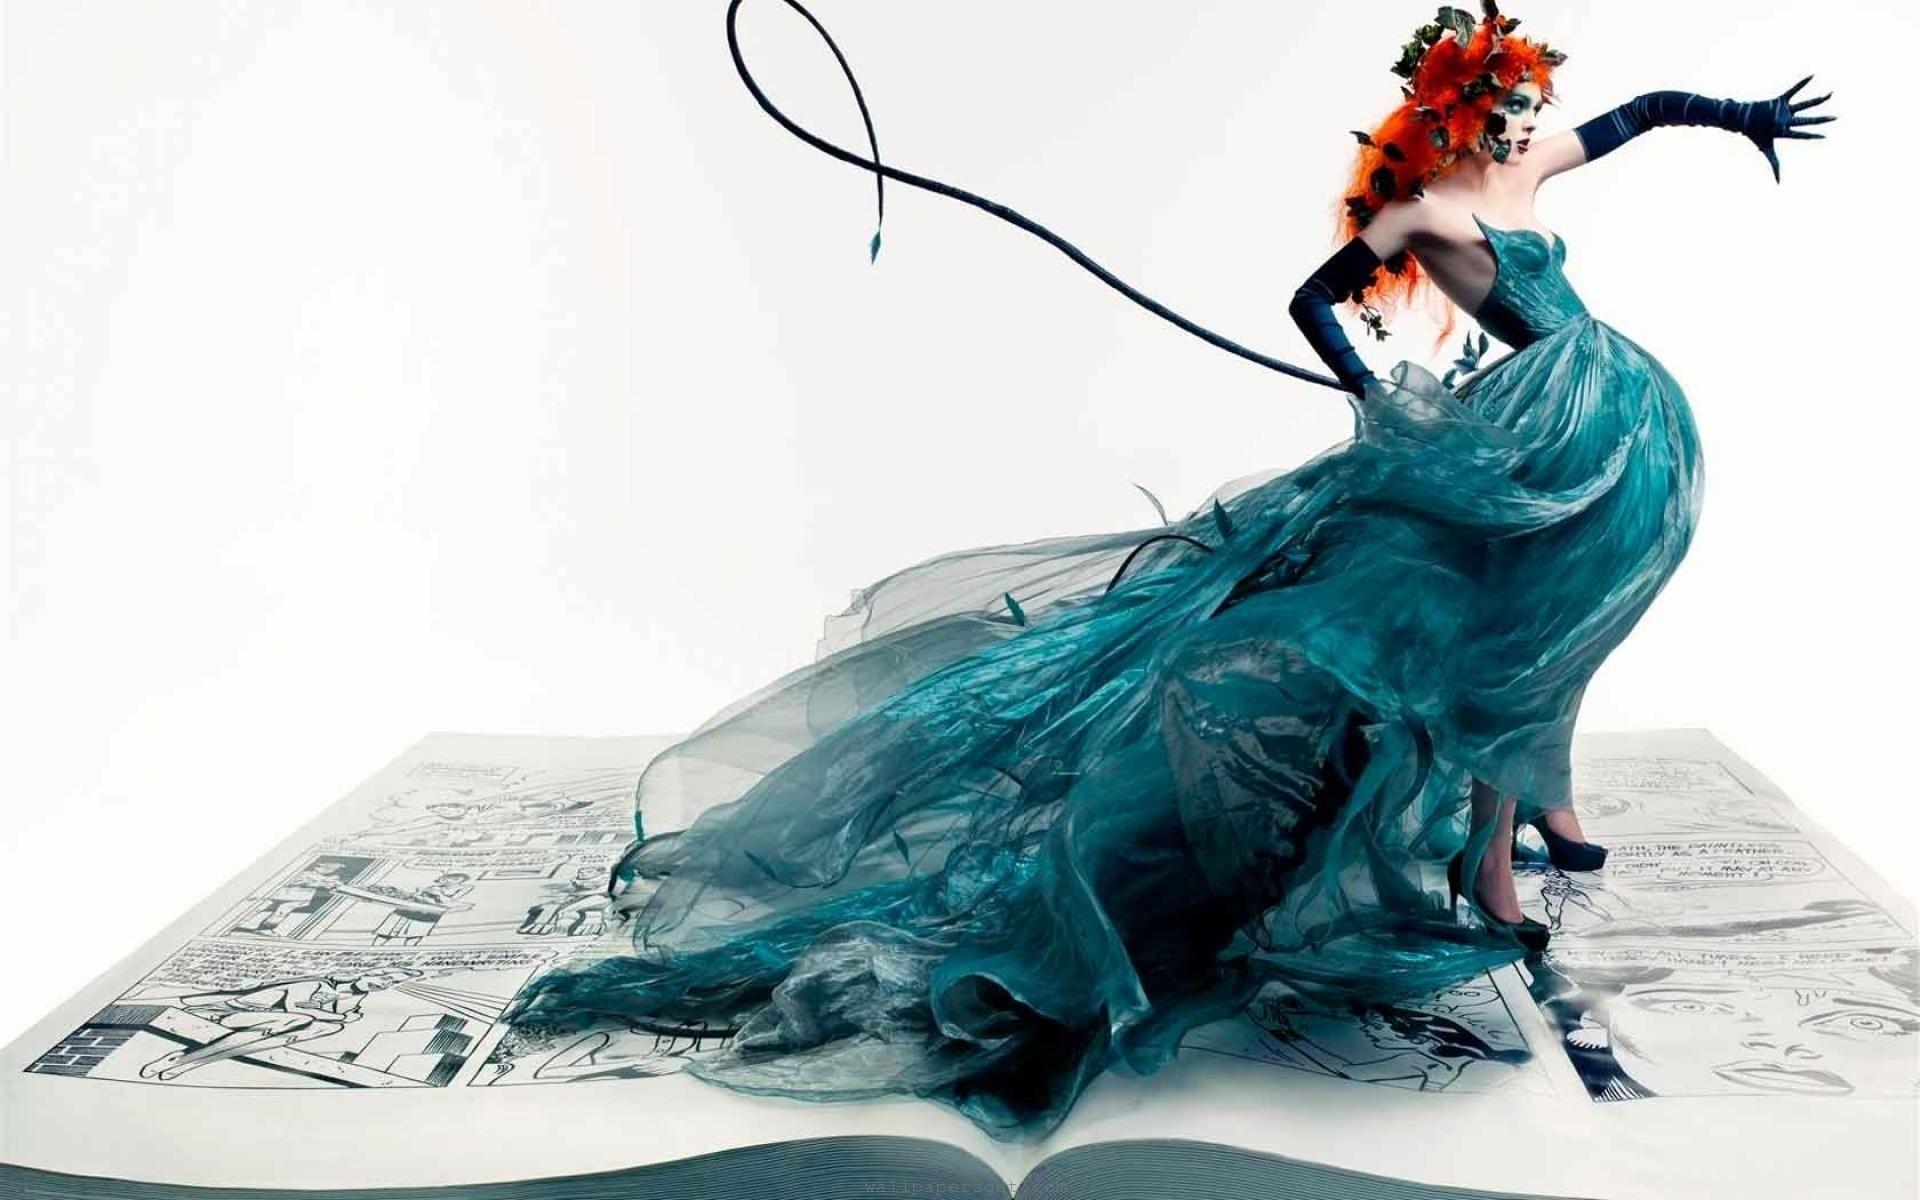 Women Gloves Artistic Redheads Fashion Illustrations Blue Dress Coco